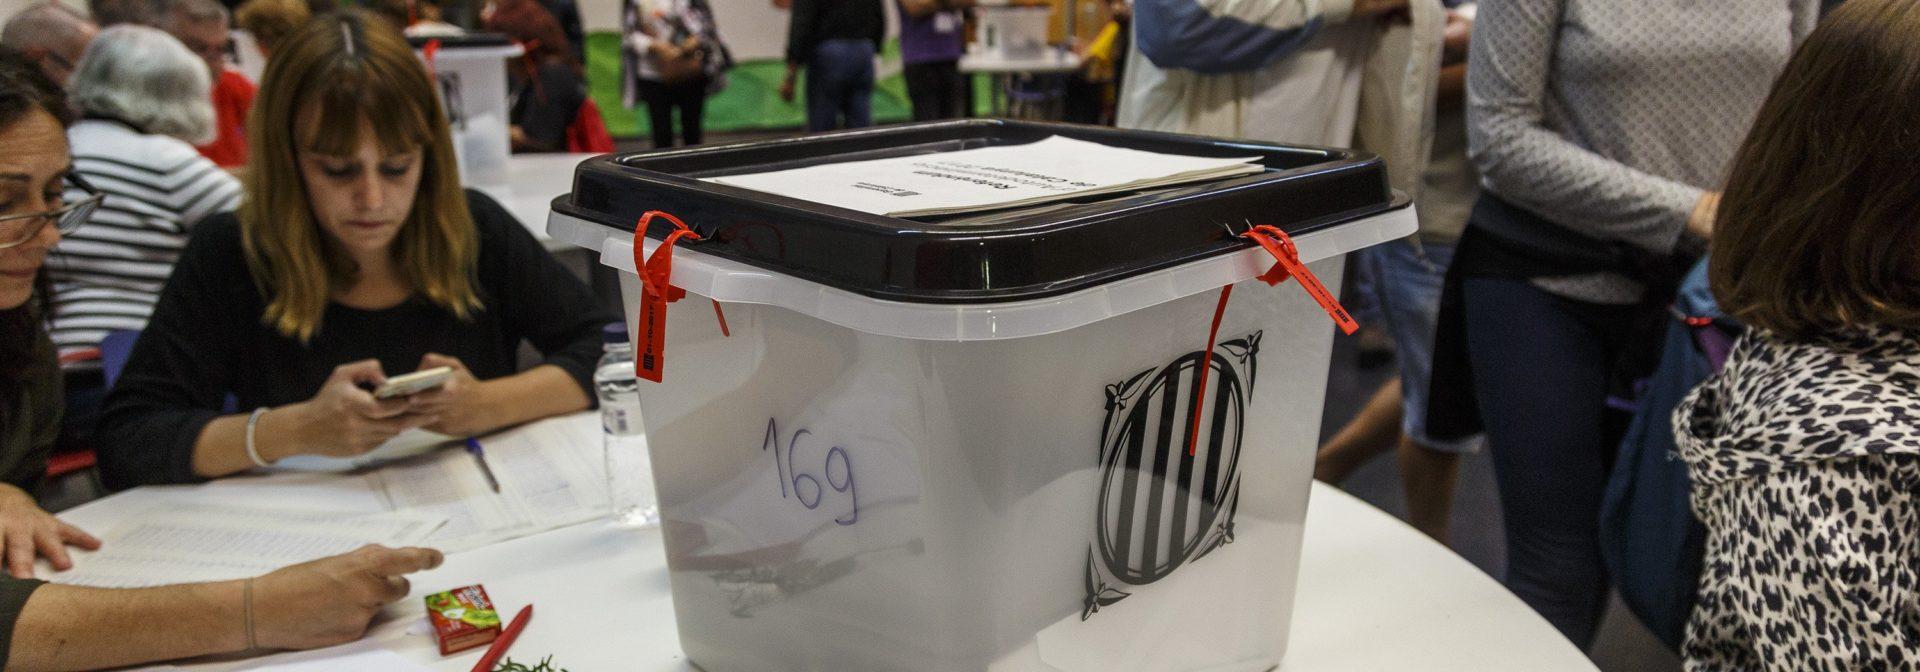 mesa-electoral-referendum-1-o-sergi-alcazar-03